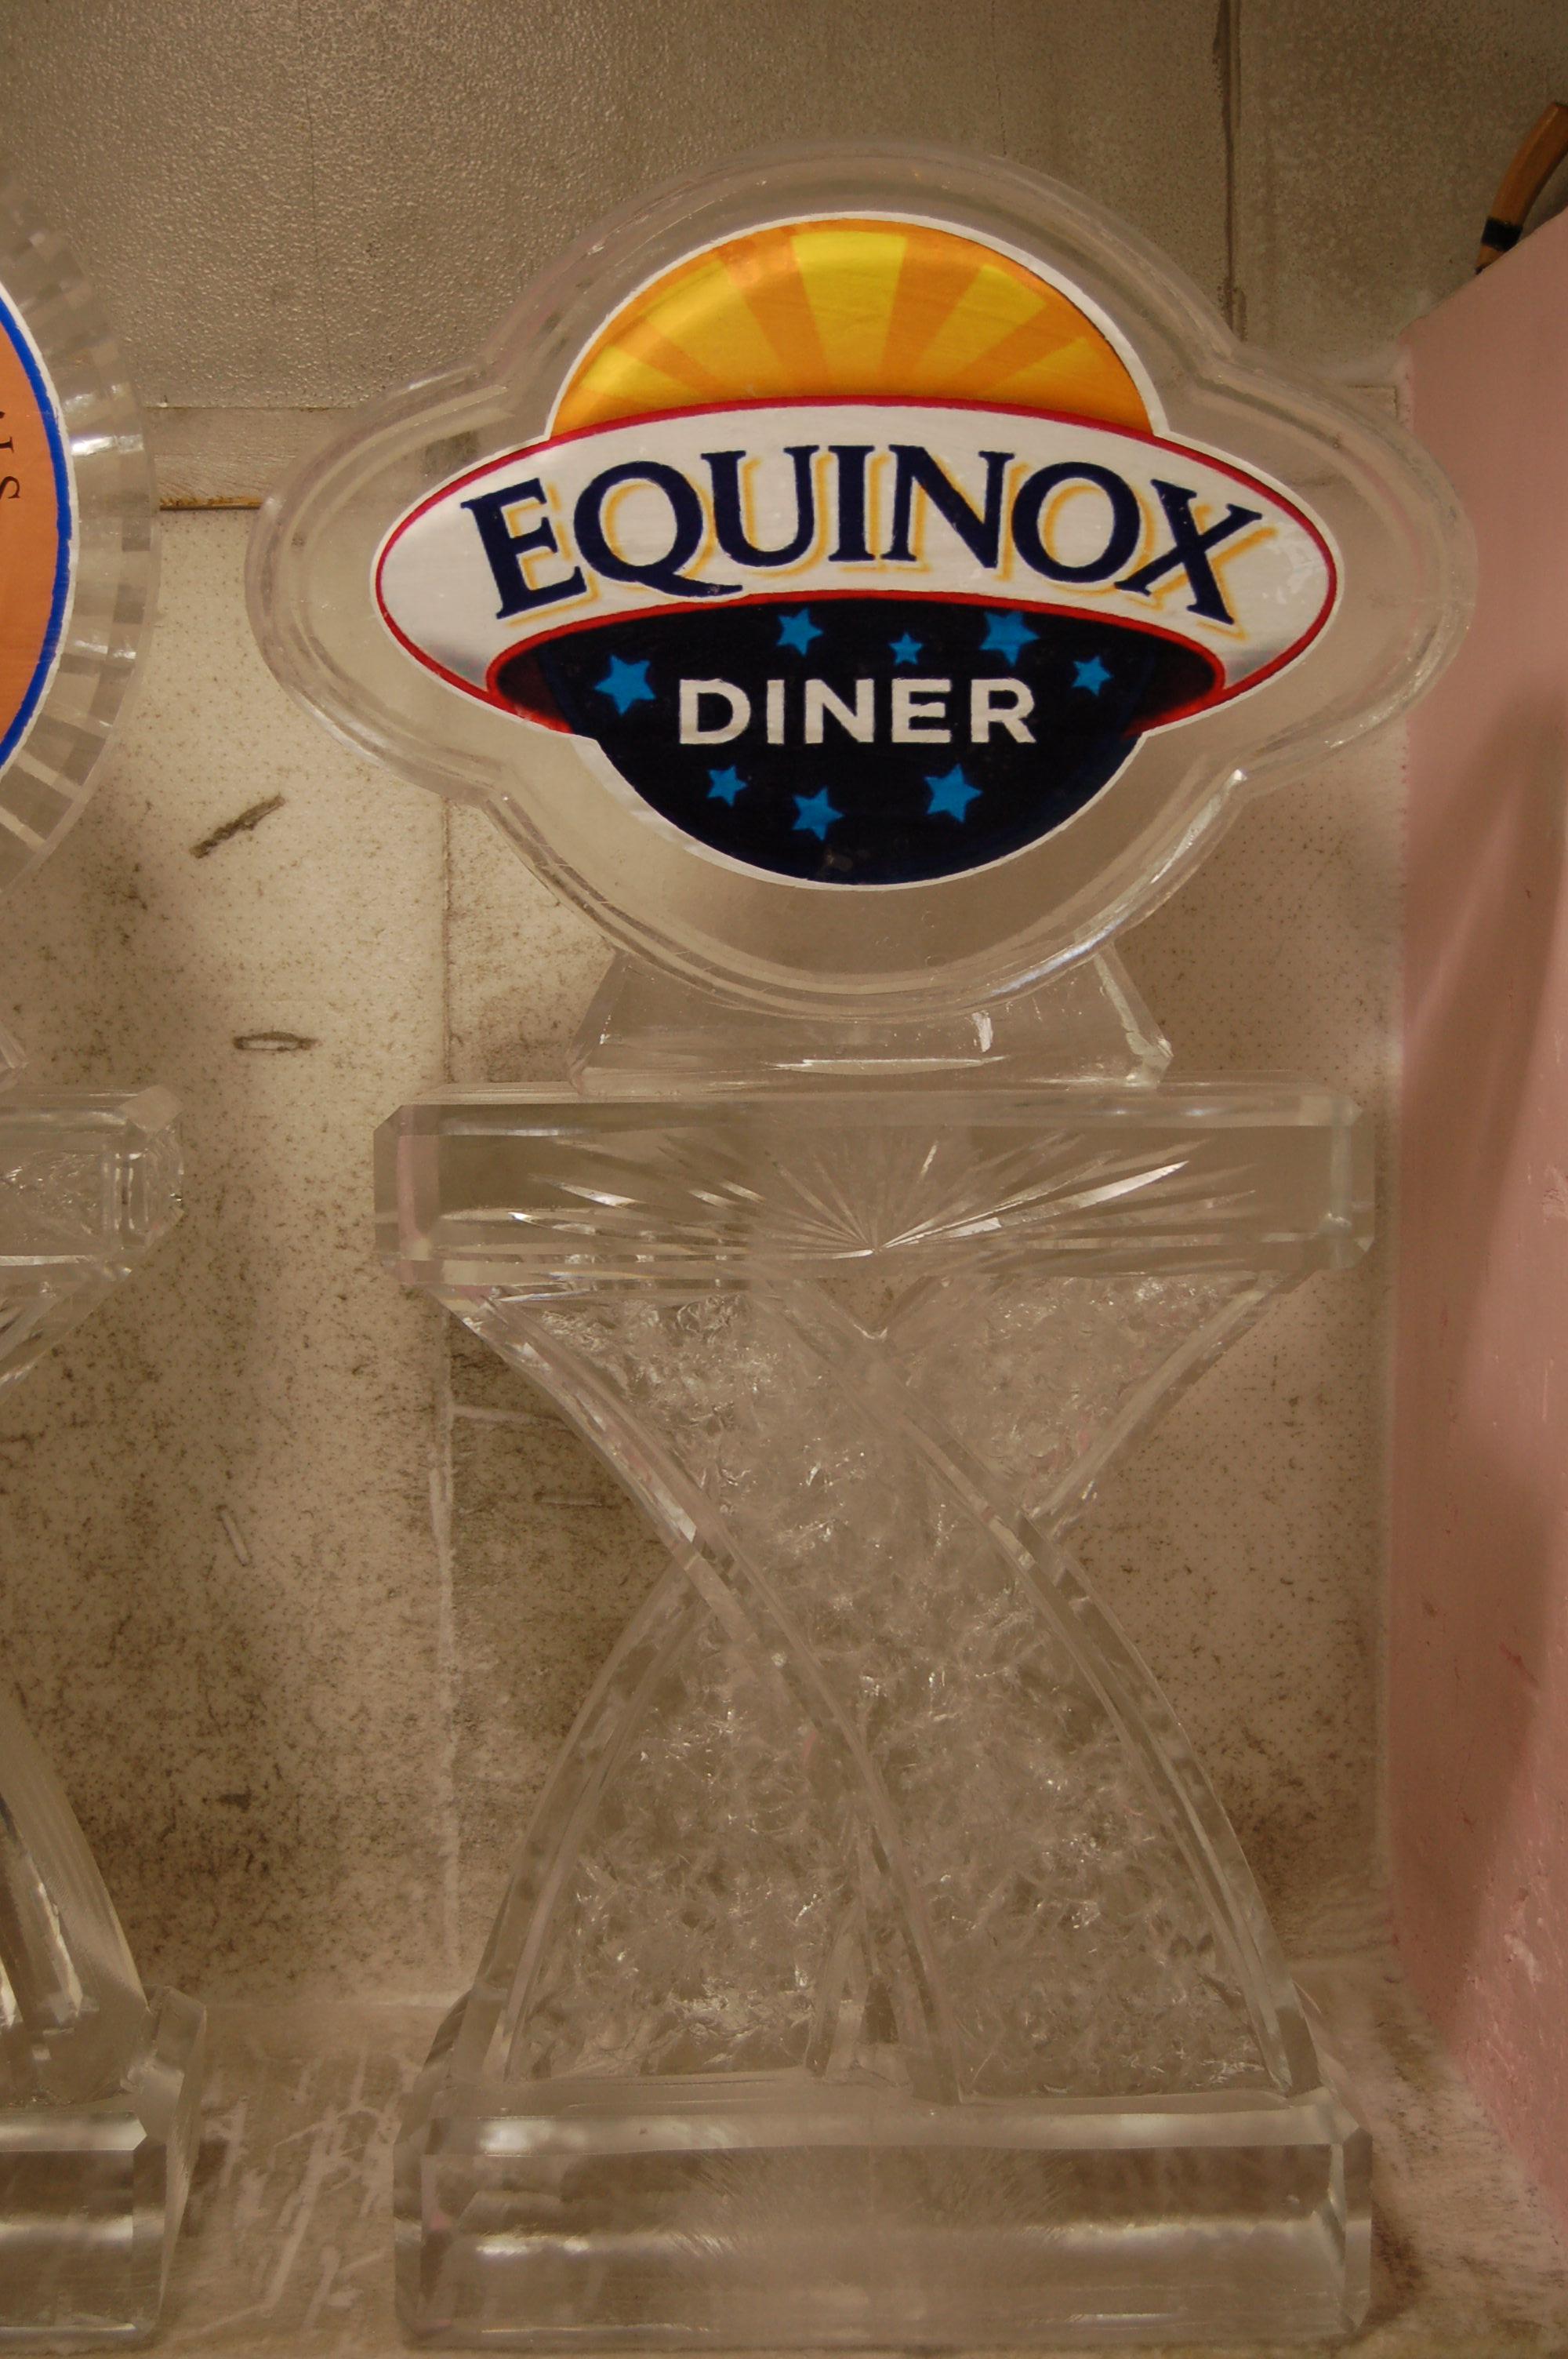 Equinox Diner